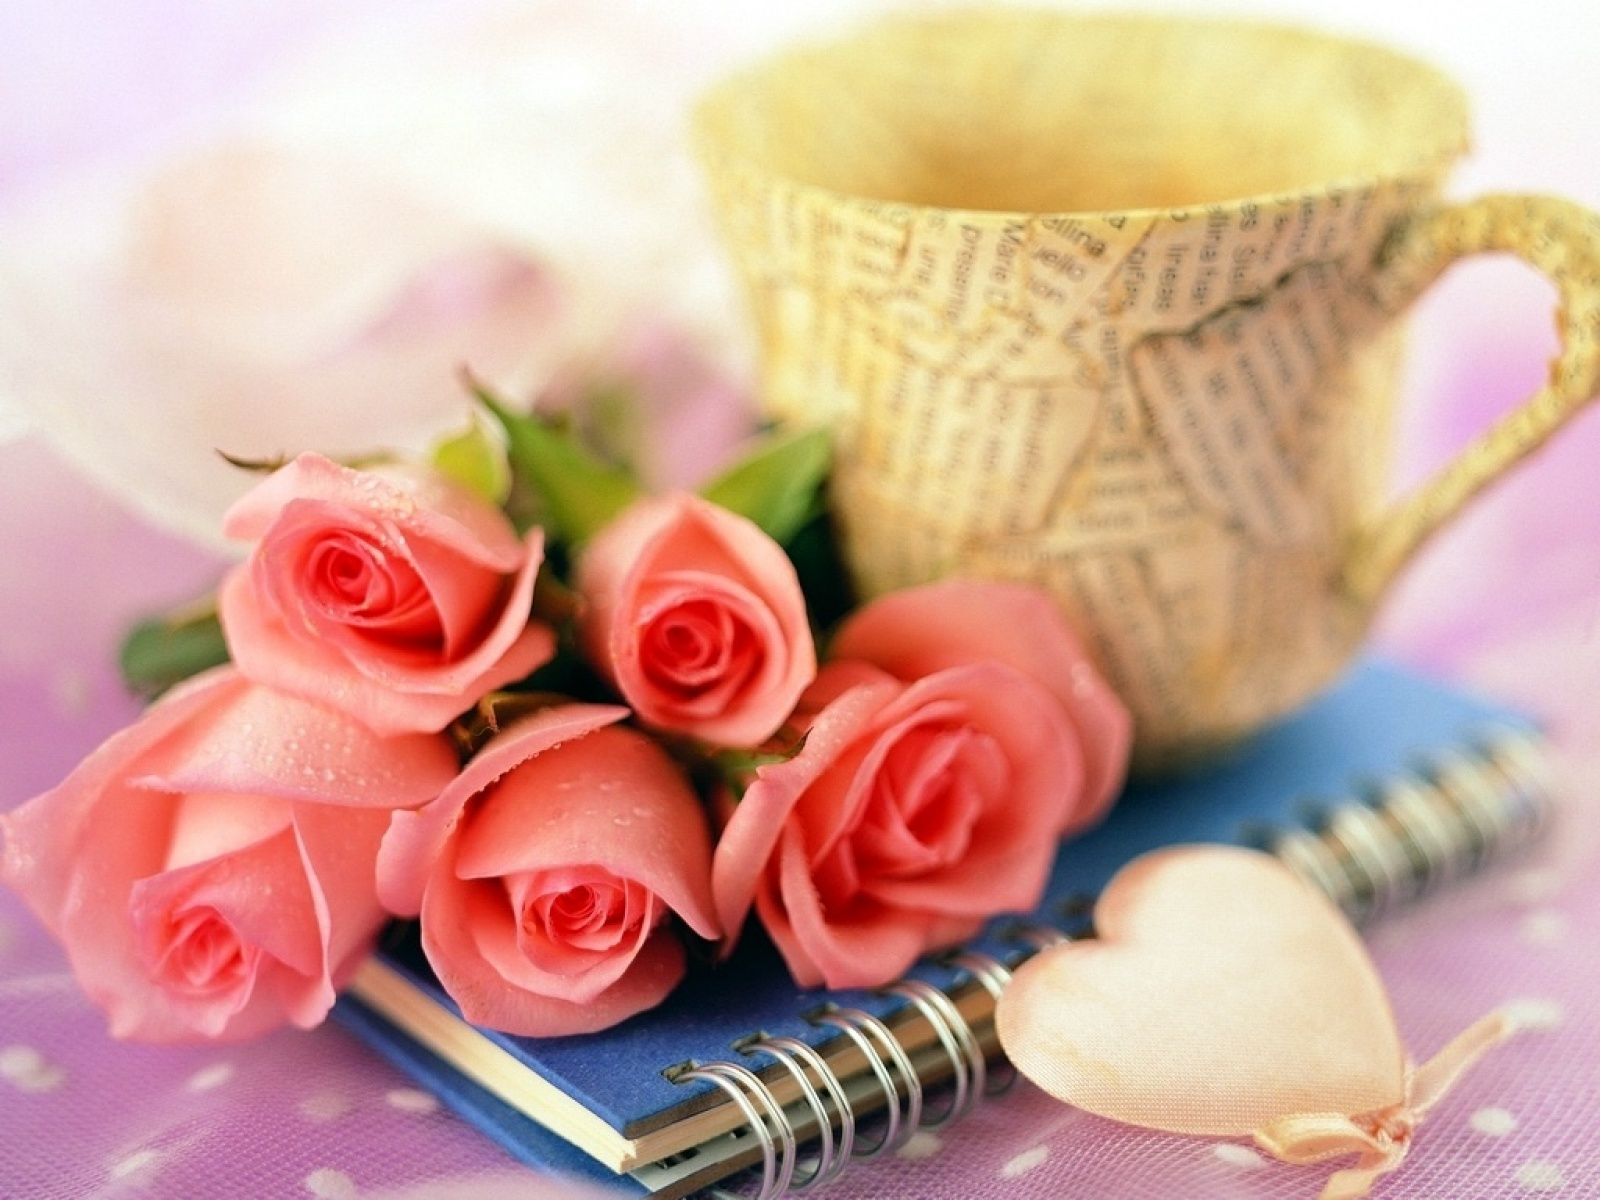 best top desktop roses wallpapers hd rose wallpaper 29 pink rosesjpg 1600x1200